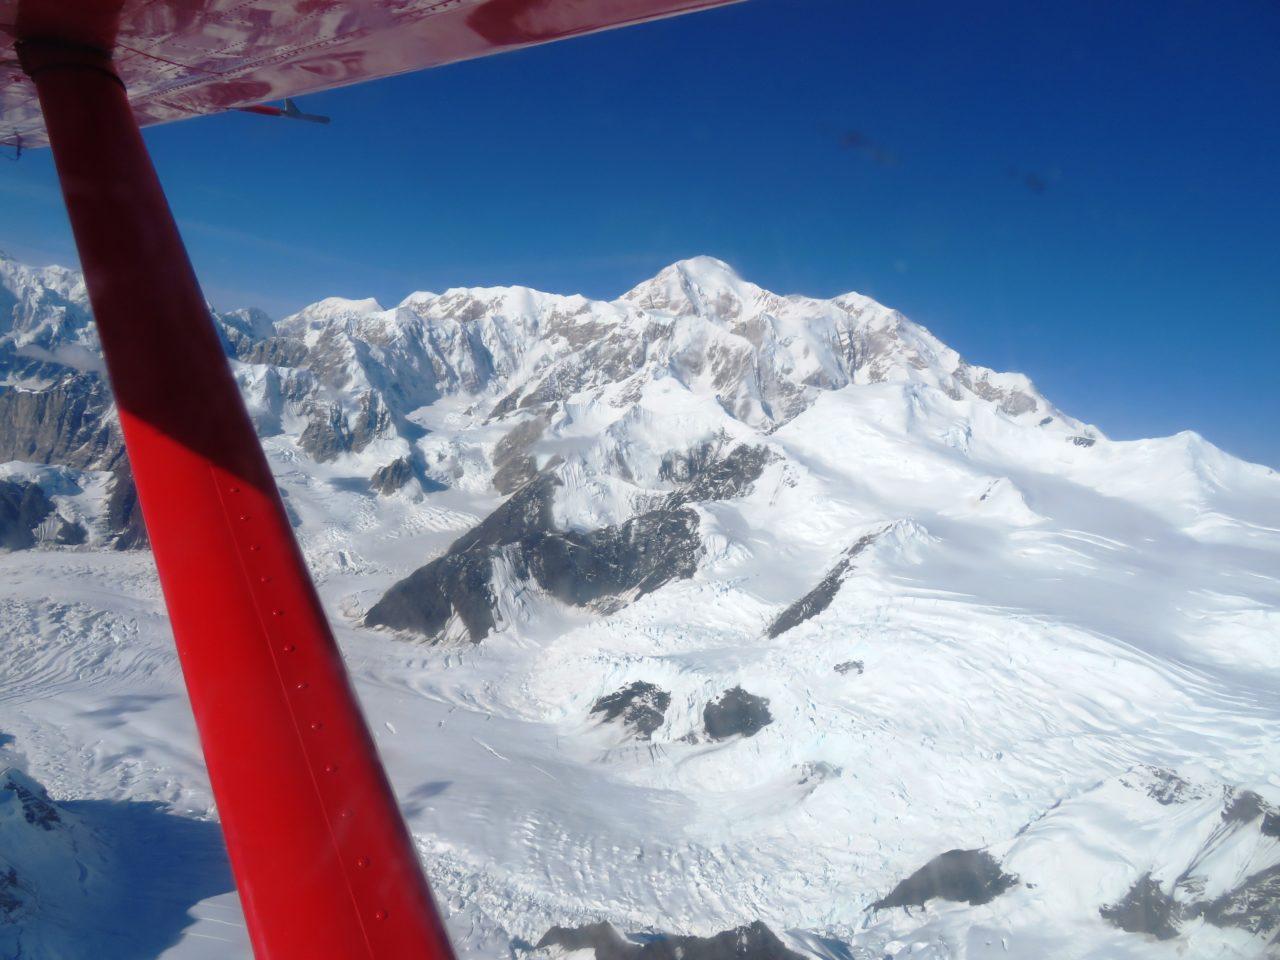 Flight around Mount Denali during our Alaska Cruise with Princess Cruises